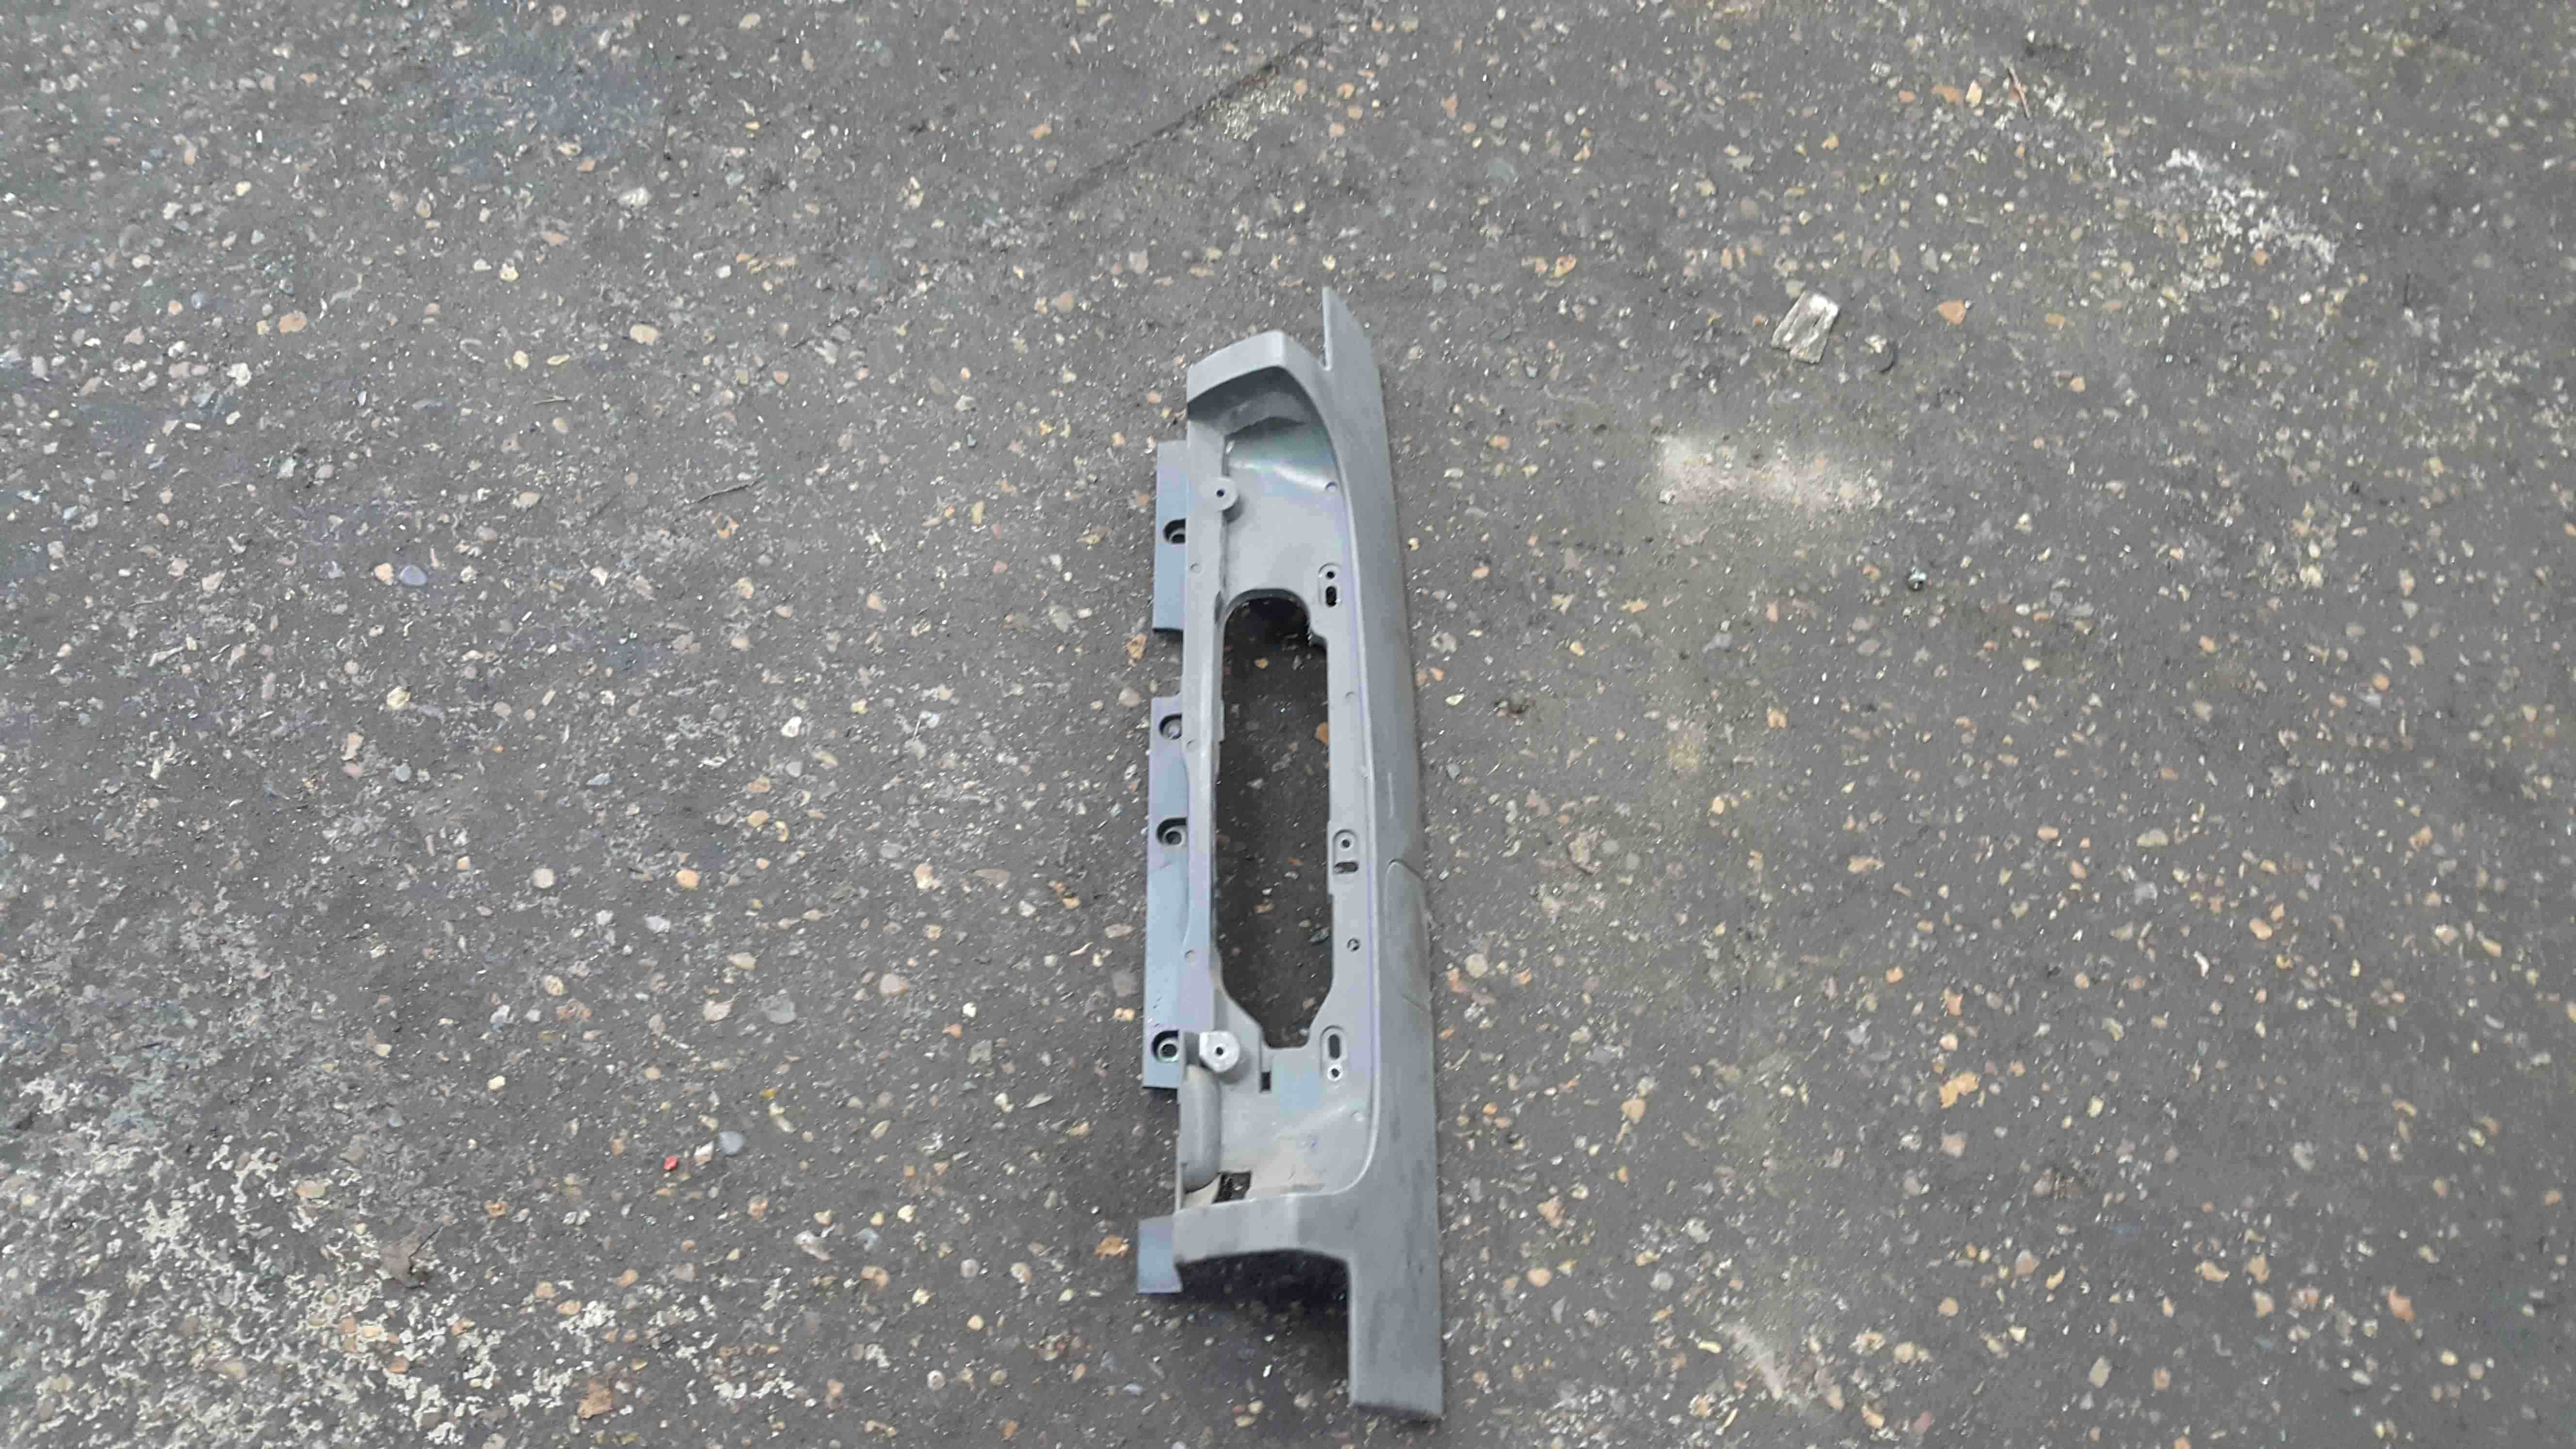 Renault Trafic 2006-2014 Drivers OSR Rear Light Case 265A60118R